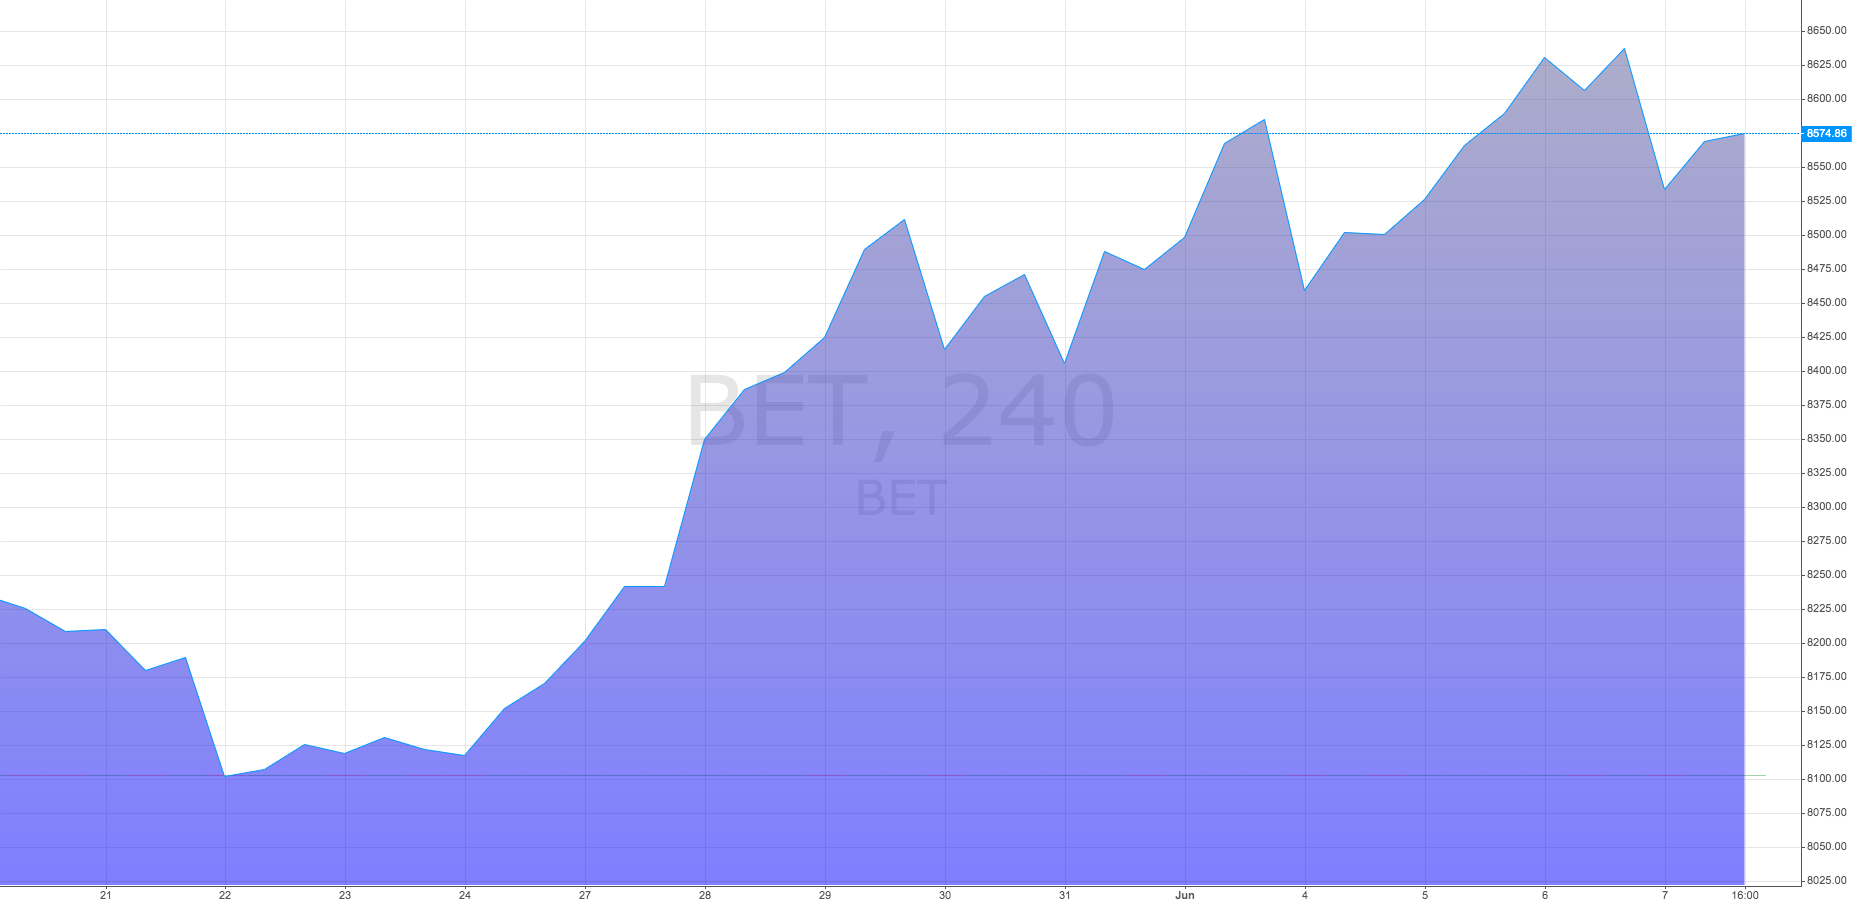 Evolutia indicelui BET Mai - Iunie 2019